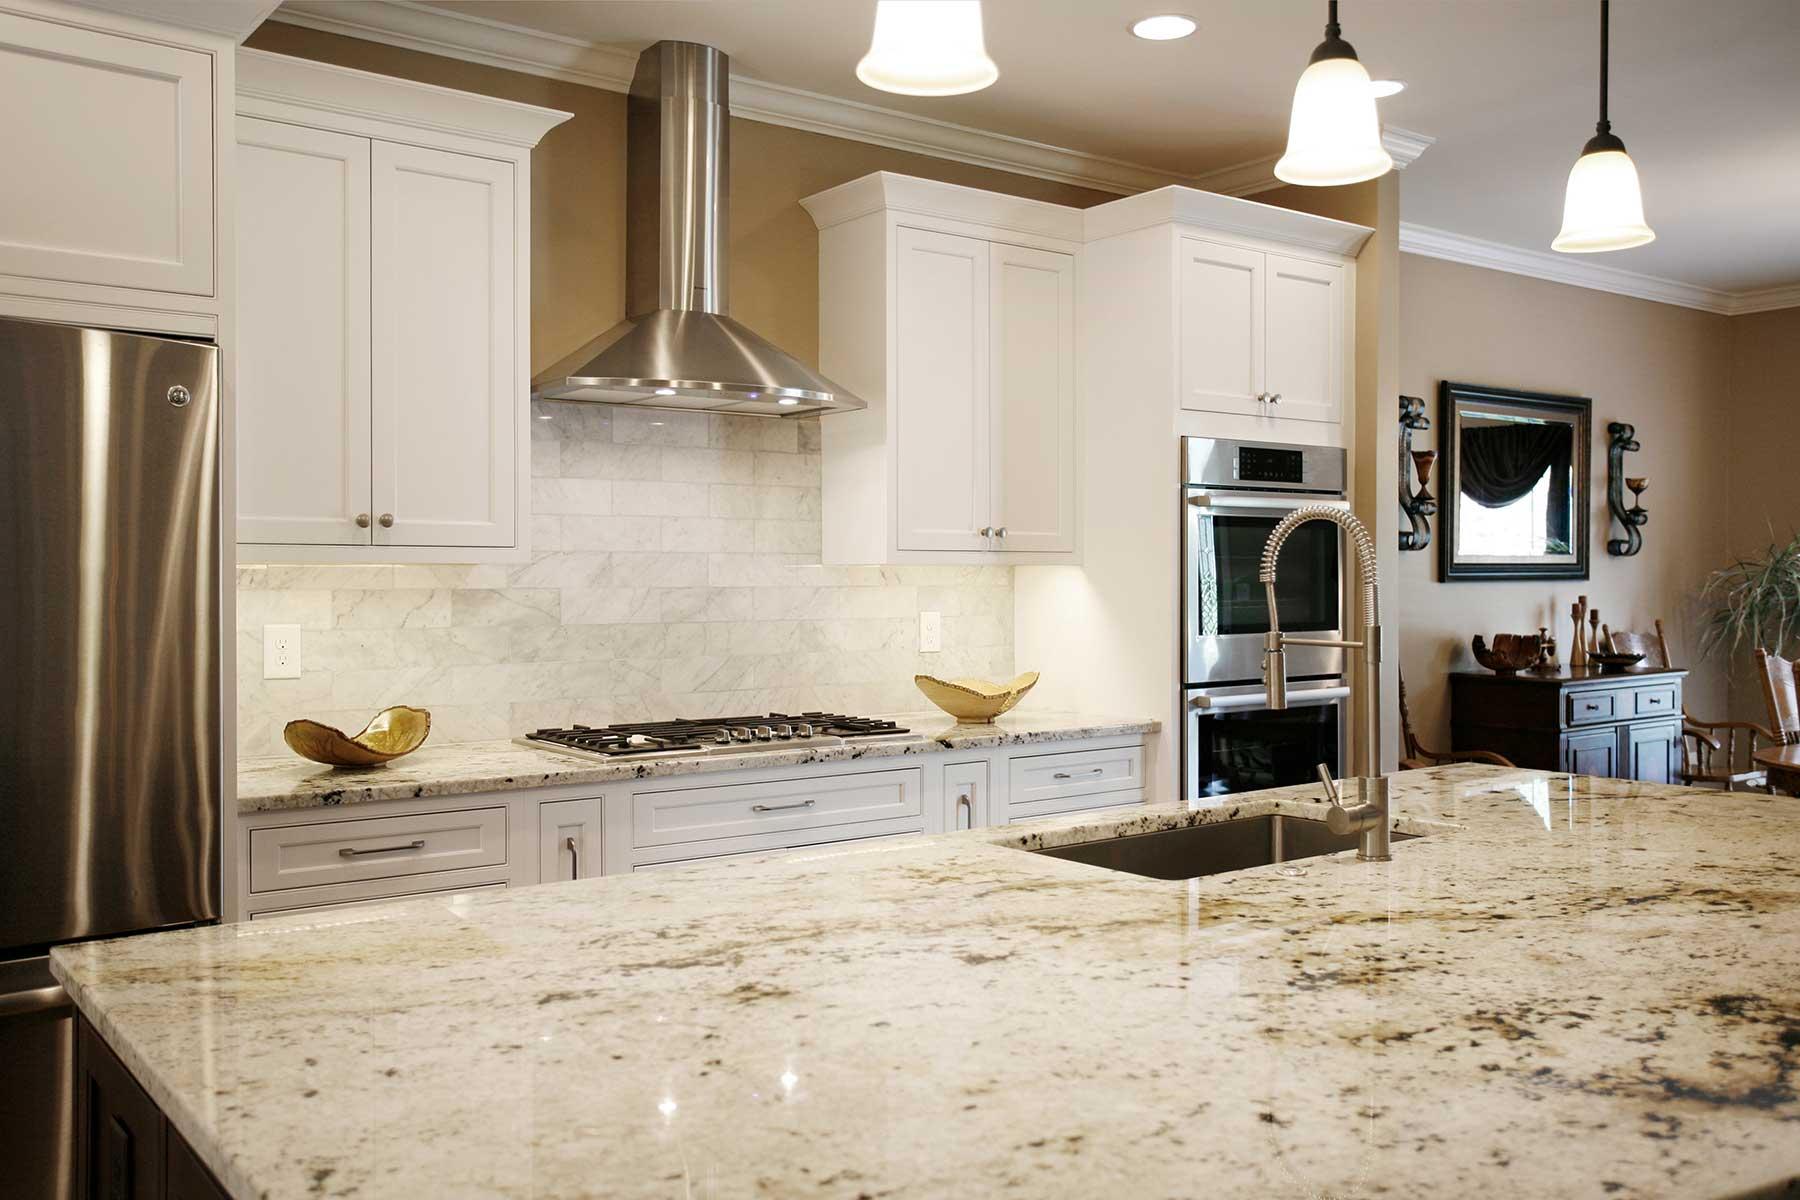 kitchen cabinets marietta ga kitchen remodeling marietta fuj